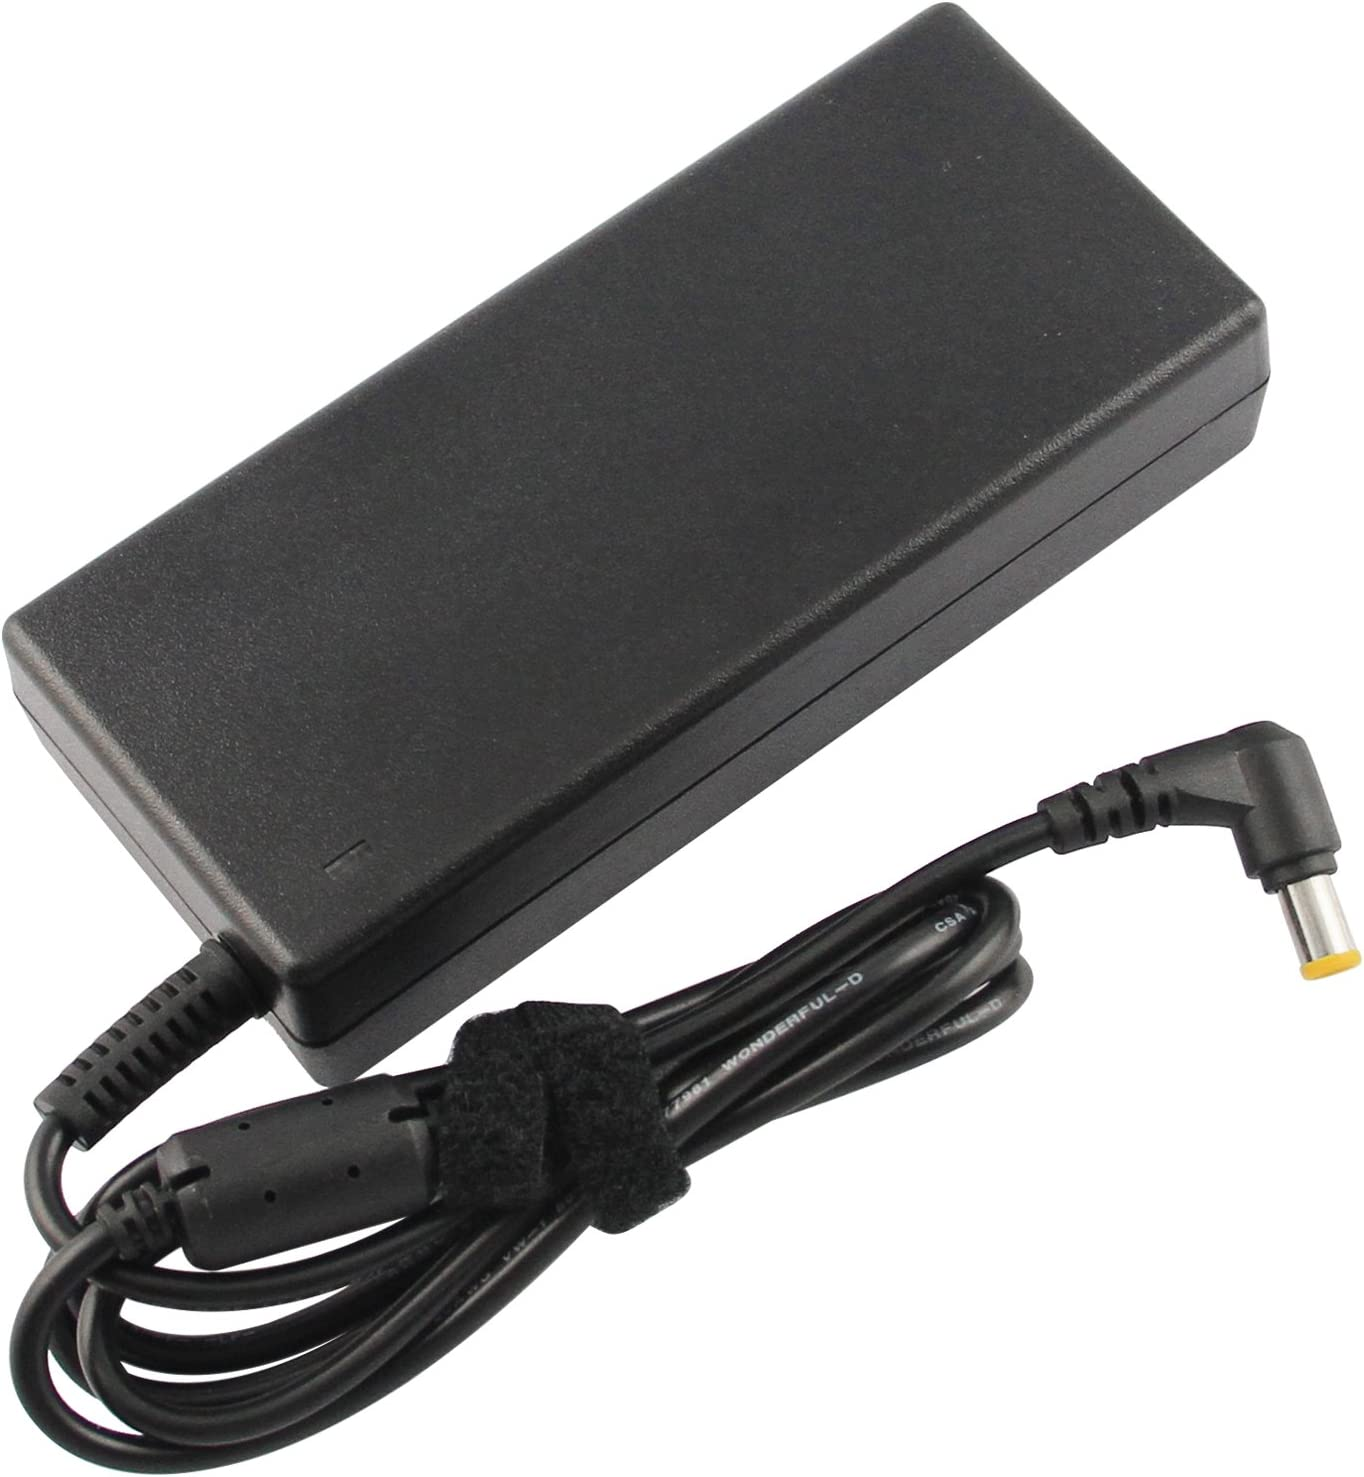 Futurebatt 19.5V 4.7A 90W AC Adapter Power Charger for Sony Vaio PCG-61215L PCG-61315L PCG-61317L PCG-61411L PCG-61511L PCG-61611L Sony VGP-AC19V10 VGP-AC19V11 VGP-AC19V14 VGP-AC19V22 Series Laptop